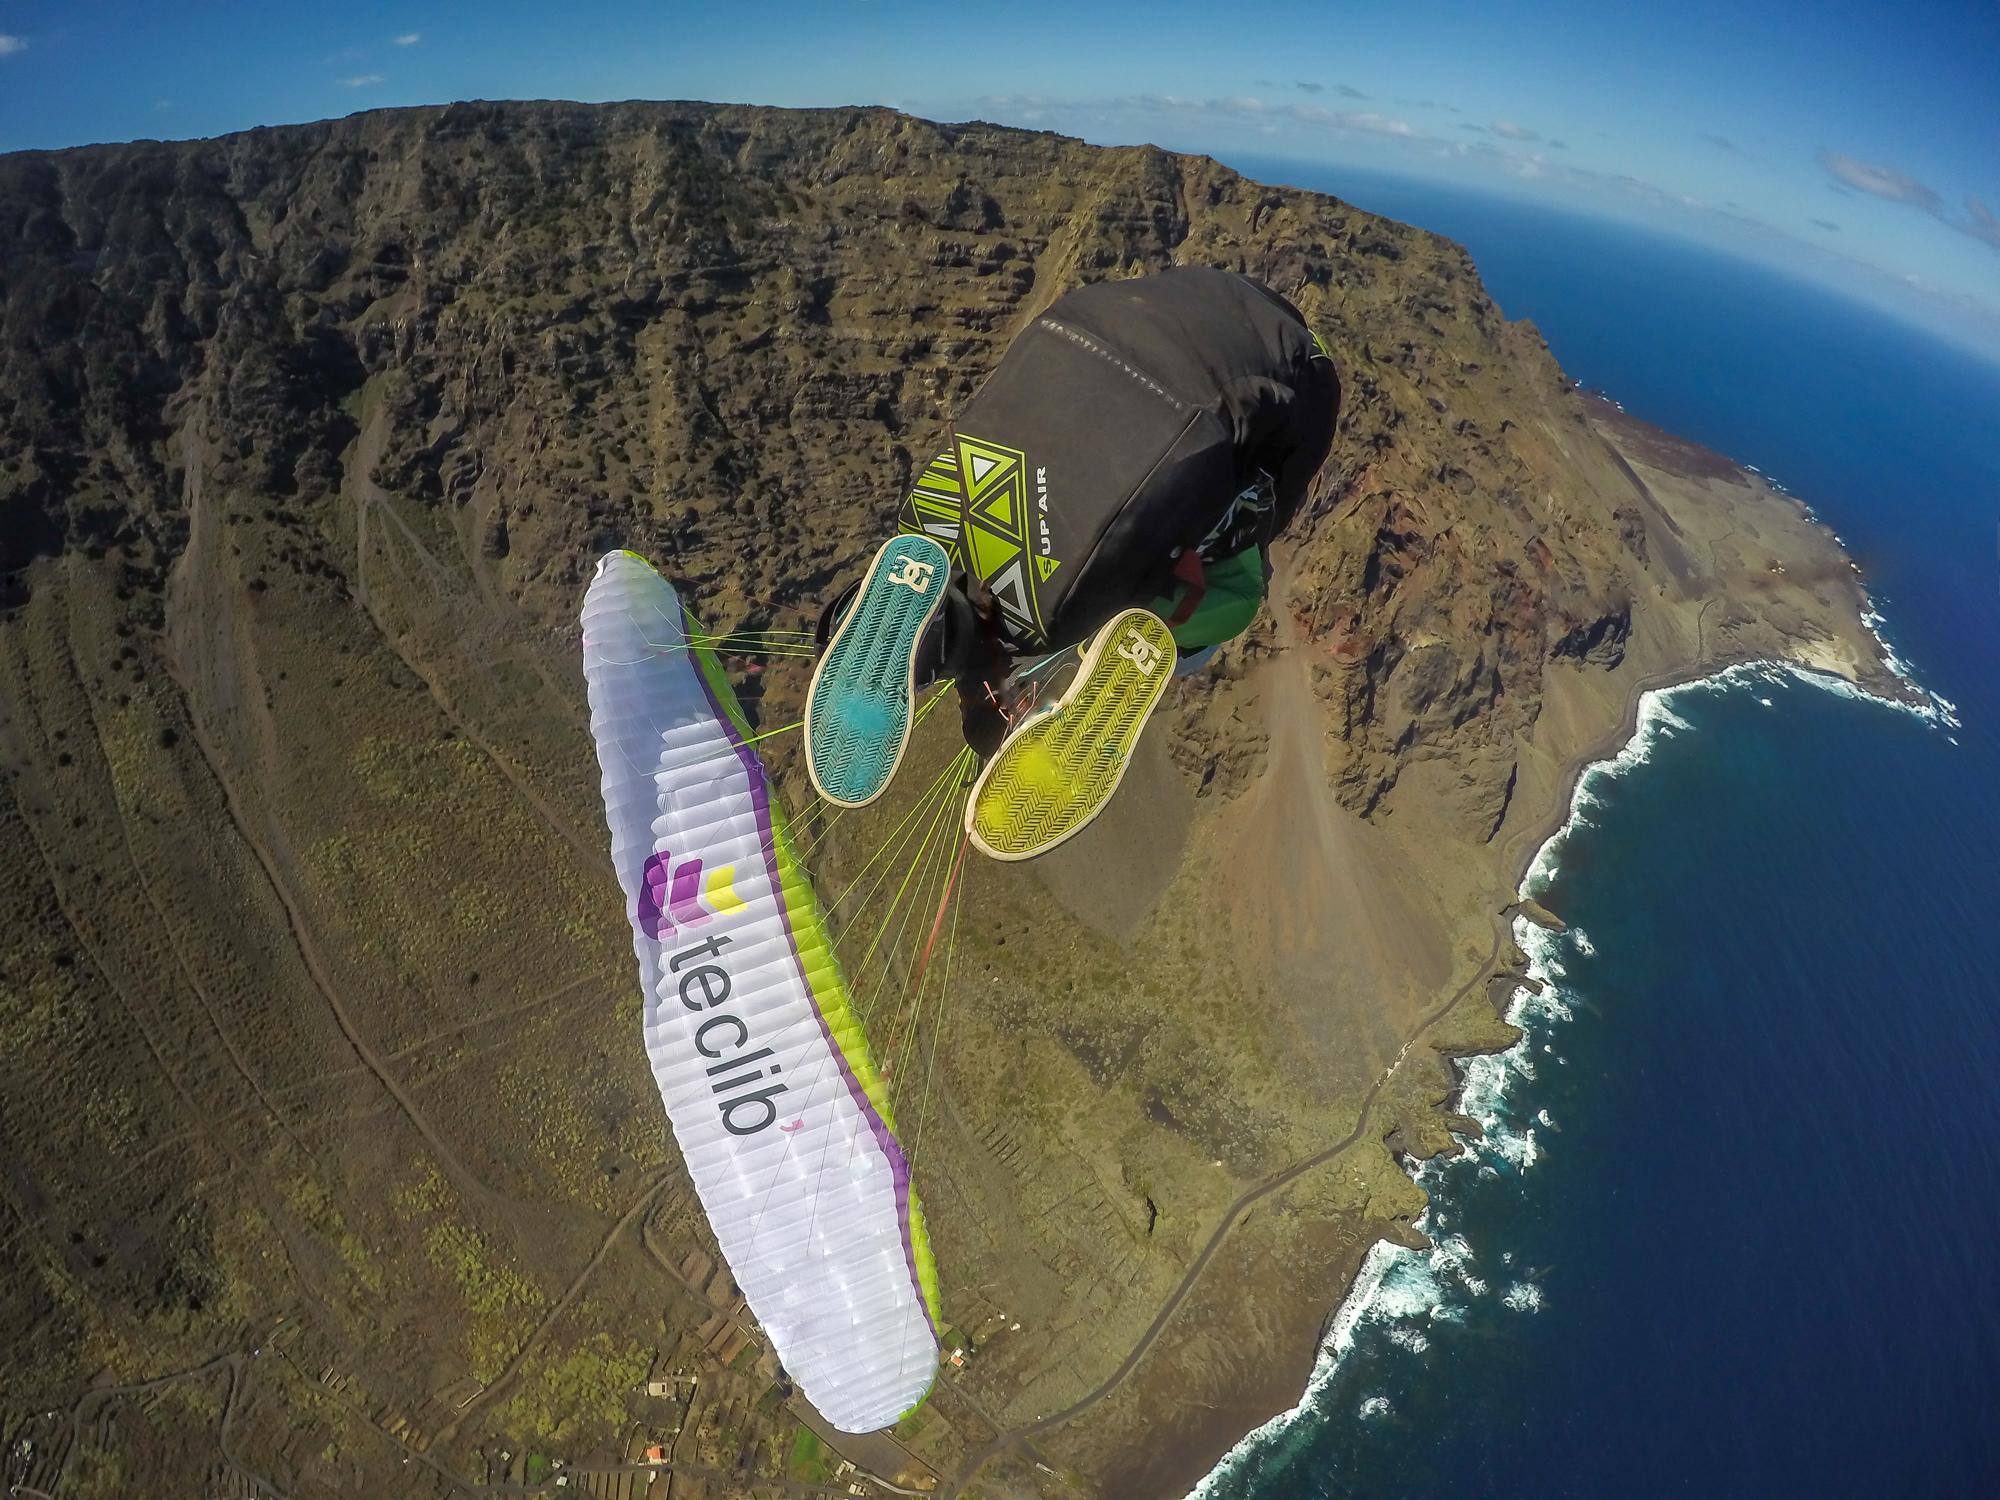 AirG Products ocean El Hierro paraglide Francois Ragolski 3